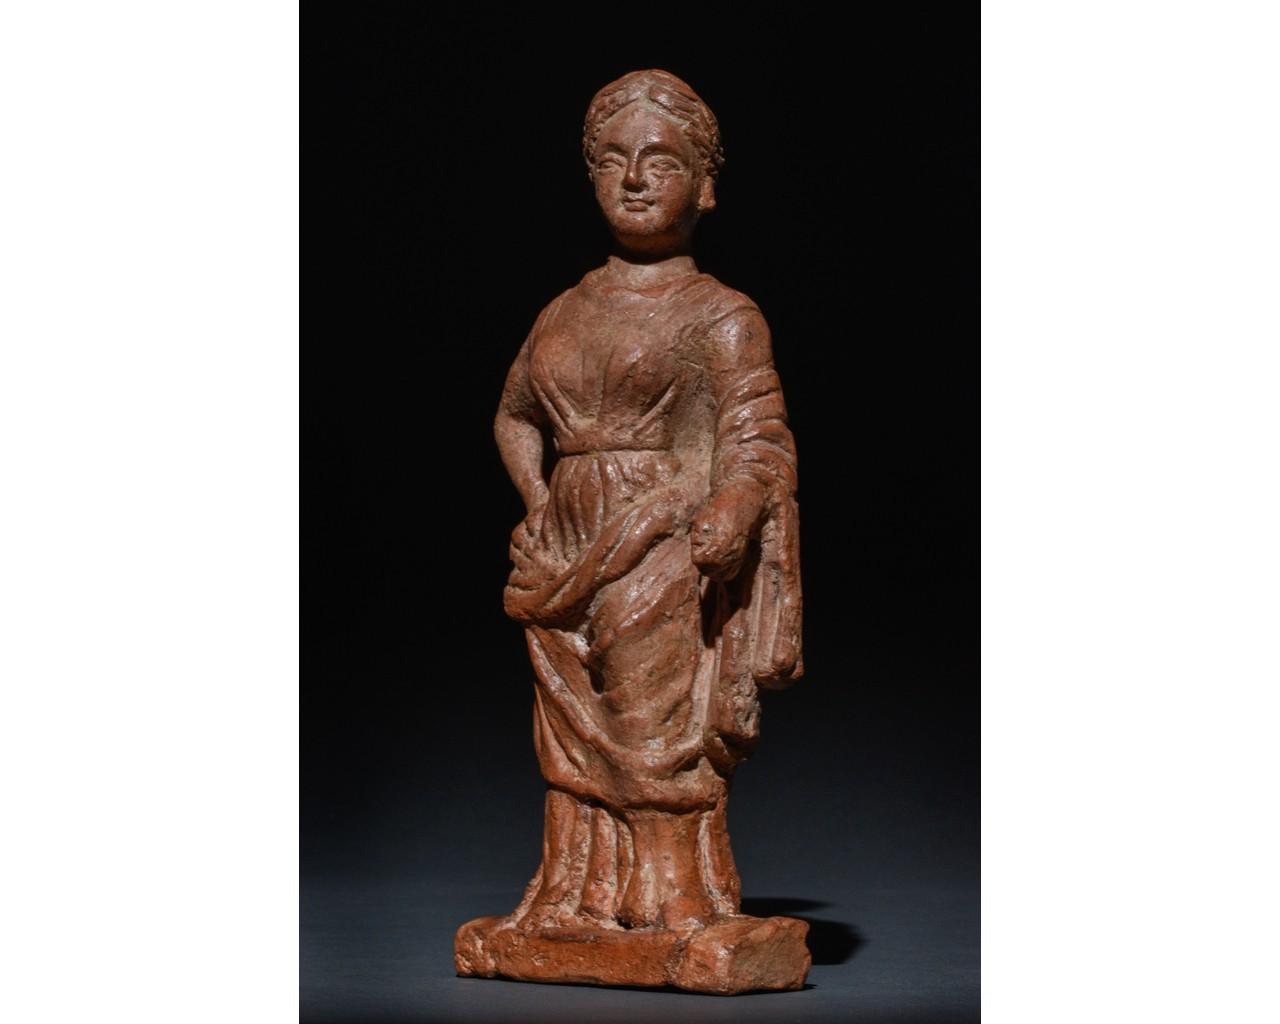 STANDING FEMALE ROMAN TERRACOTTA FIGURE - Image 2 of 9